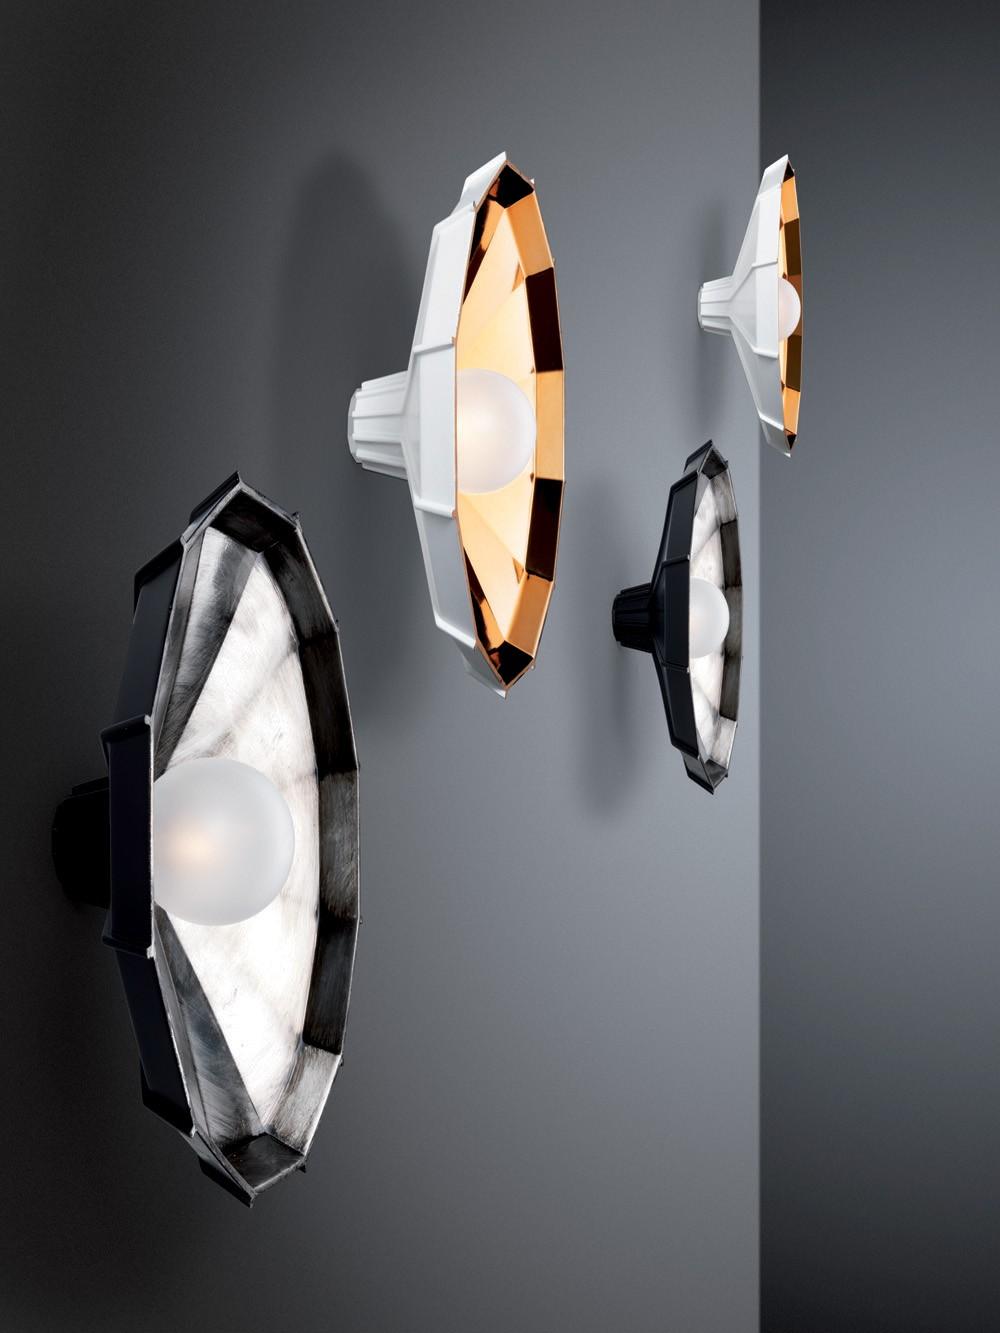 foscarini-diesel-mysterio-wall-lamp-3.jpg